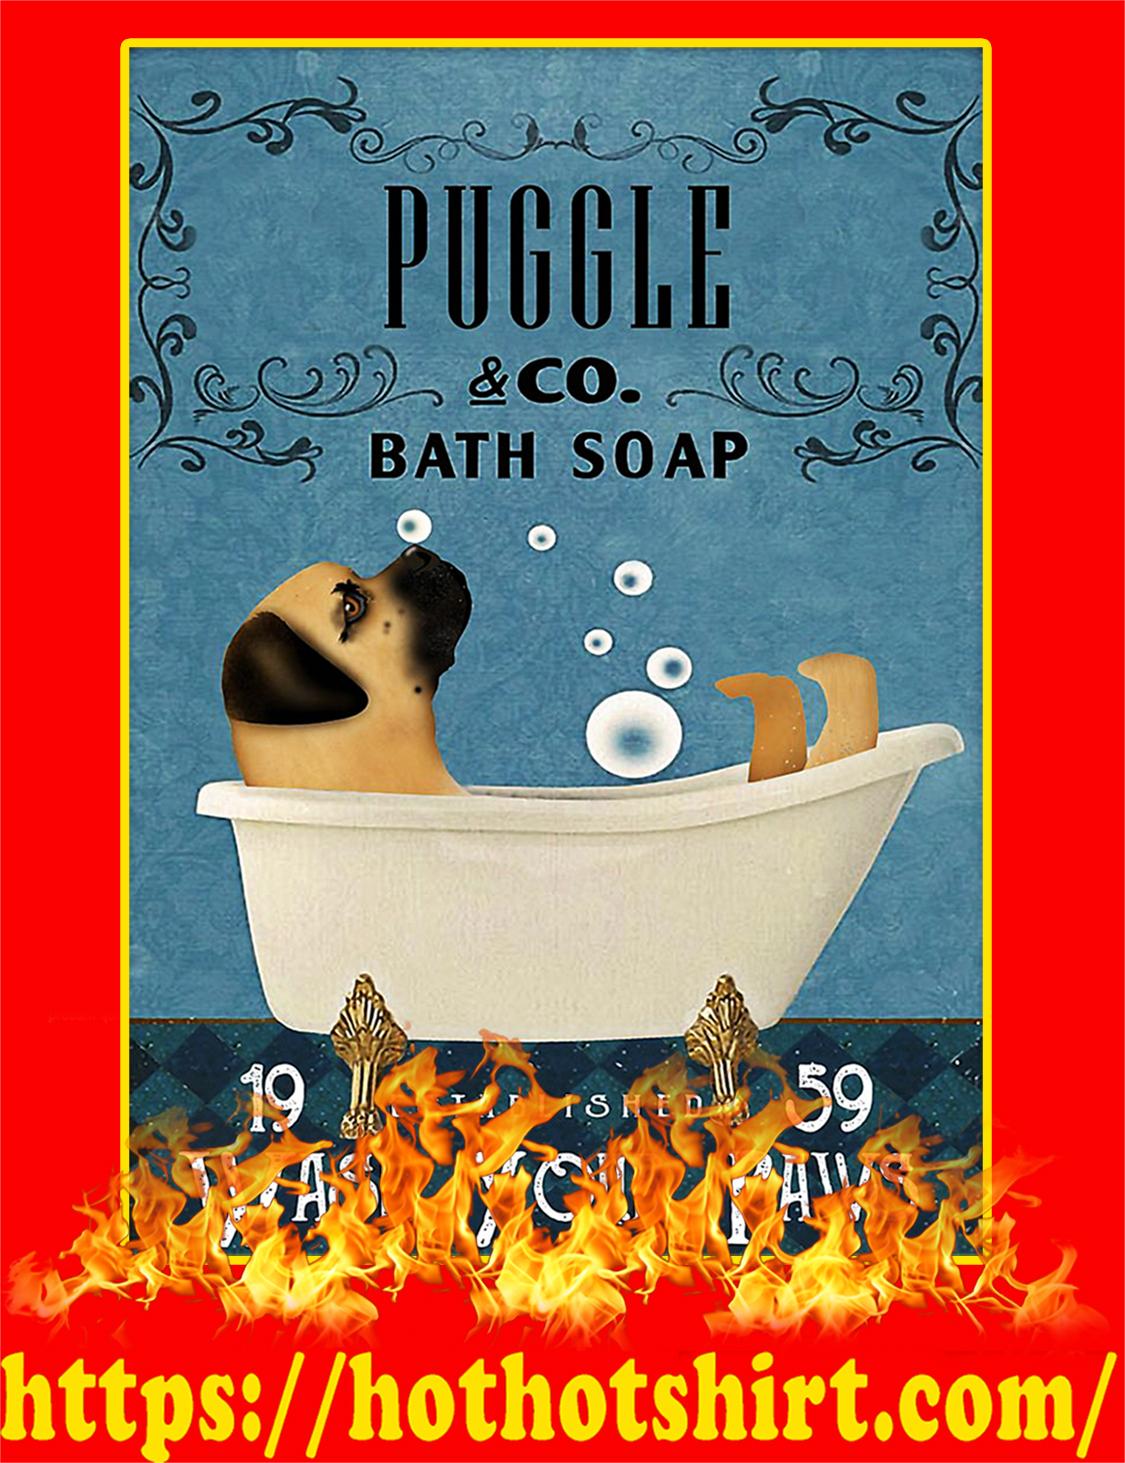 Bath Soap Company Puggle Poster - A1